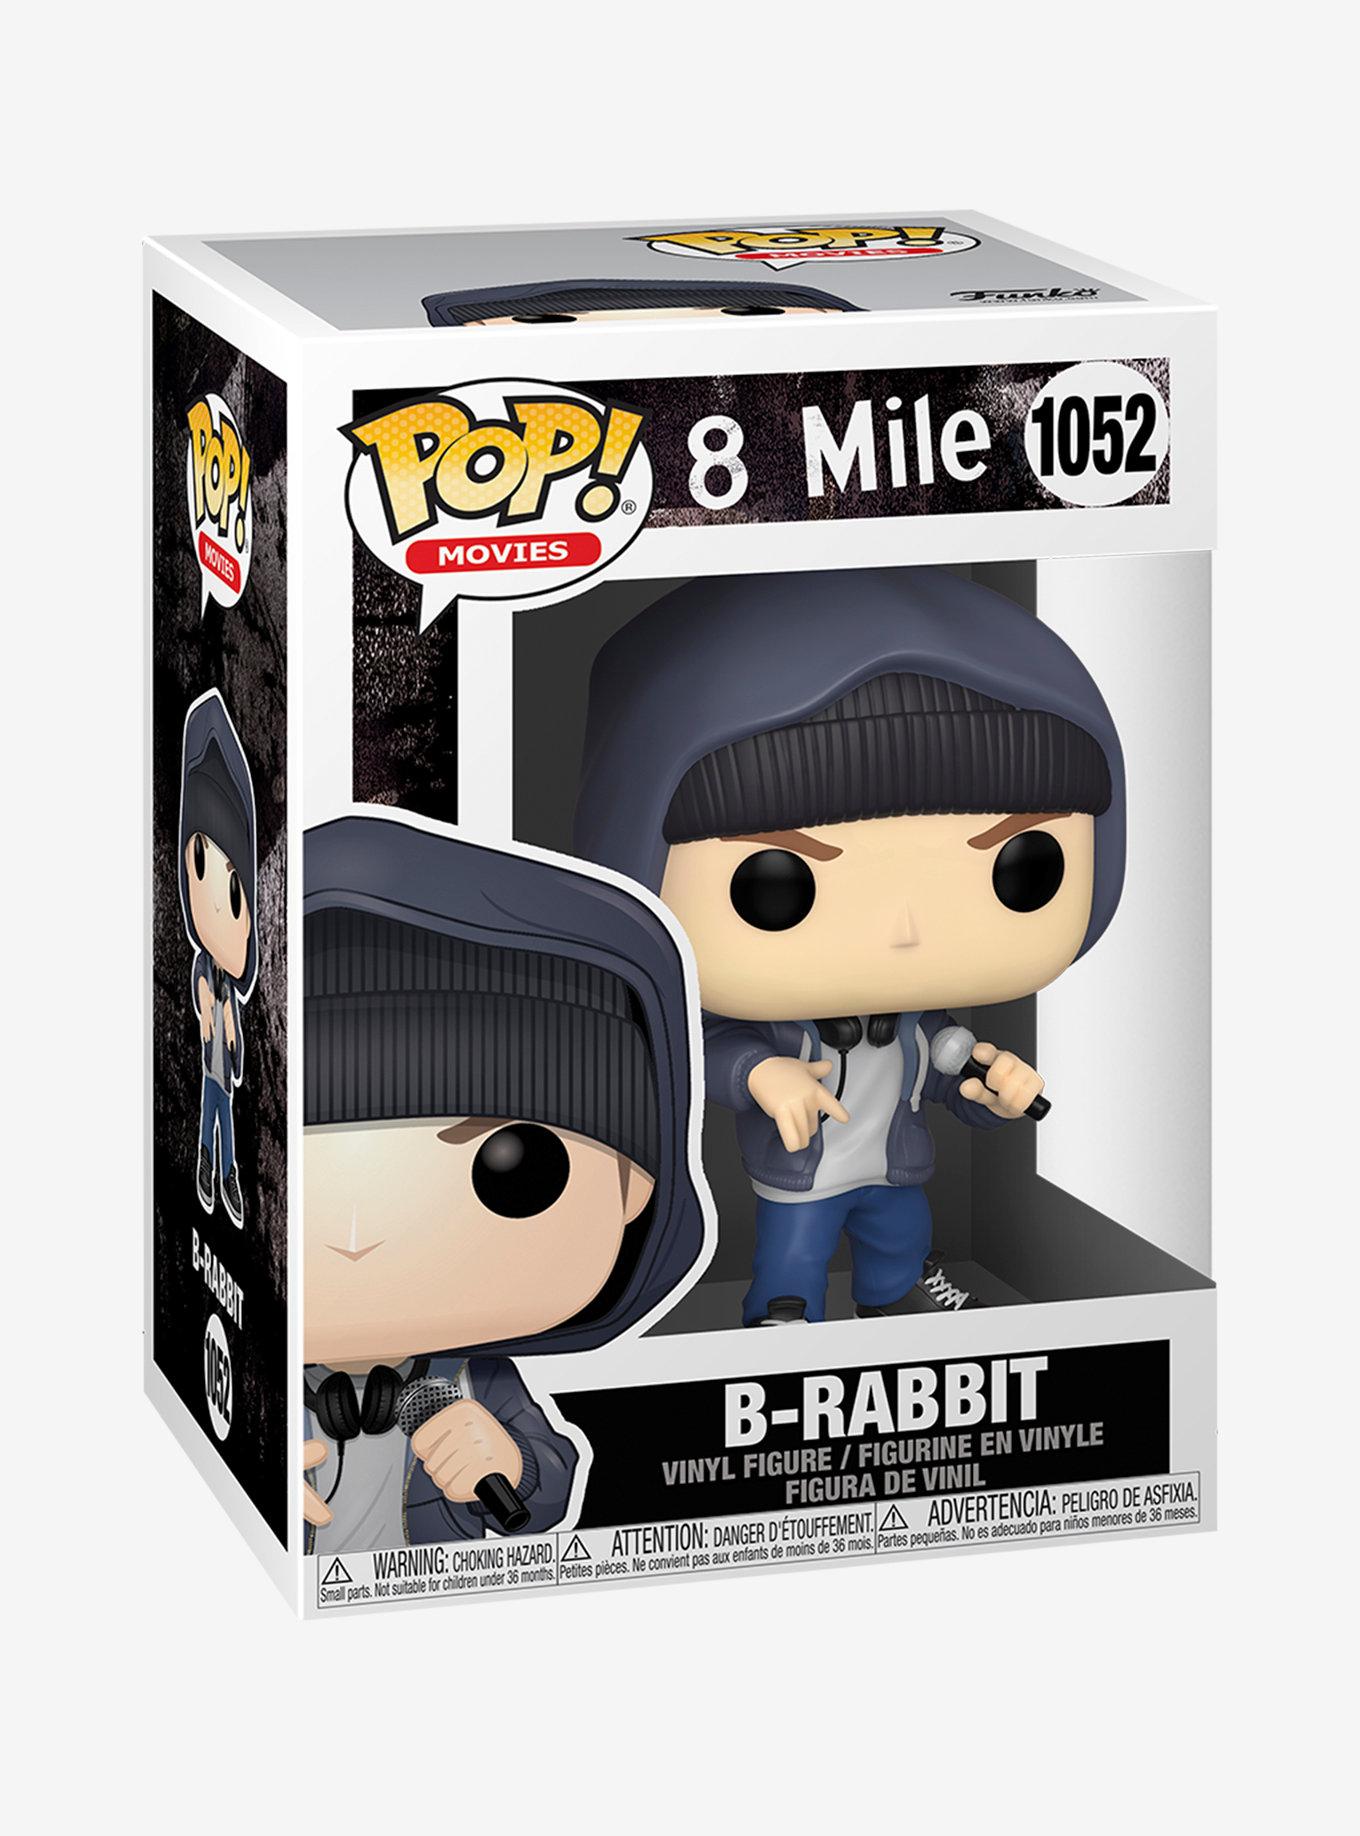 Eminem Gets His Funko Pop! Figure